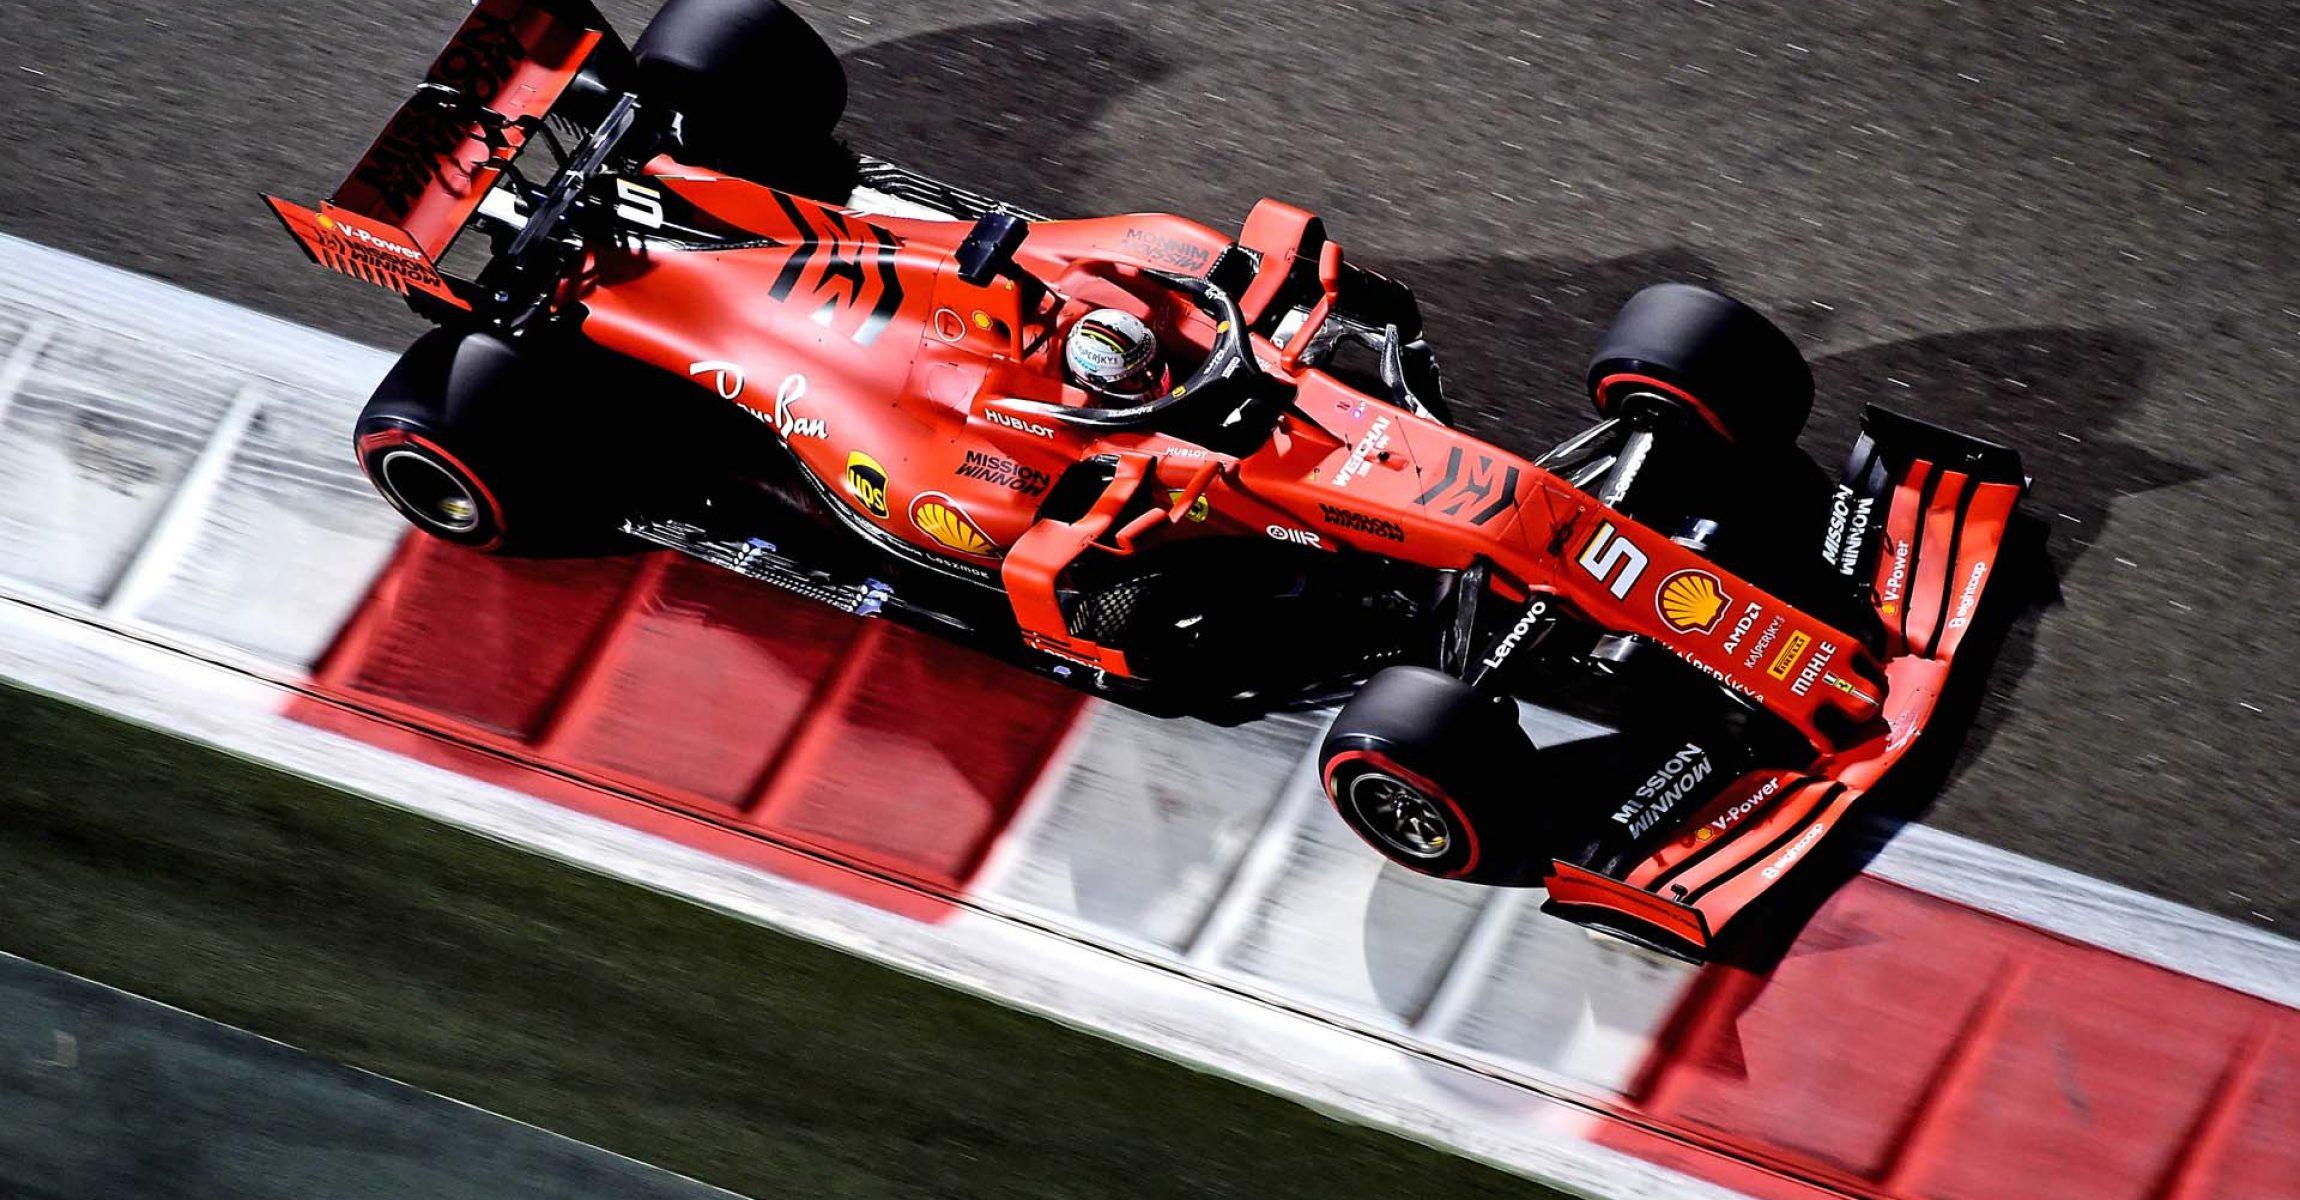 GP ABU DHABI F1/2019 - VENERDÌ 29/11/2019 credit: @Scuderia Ferrari Press Office Sebastian Vettel